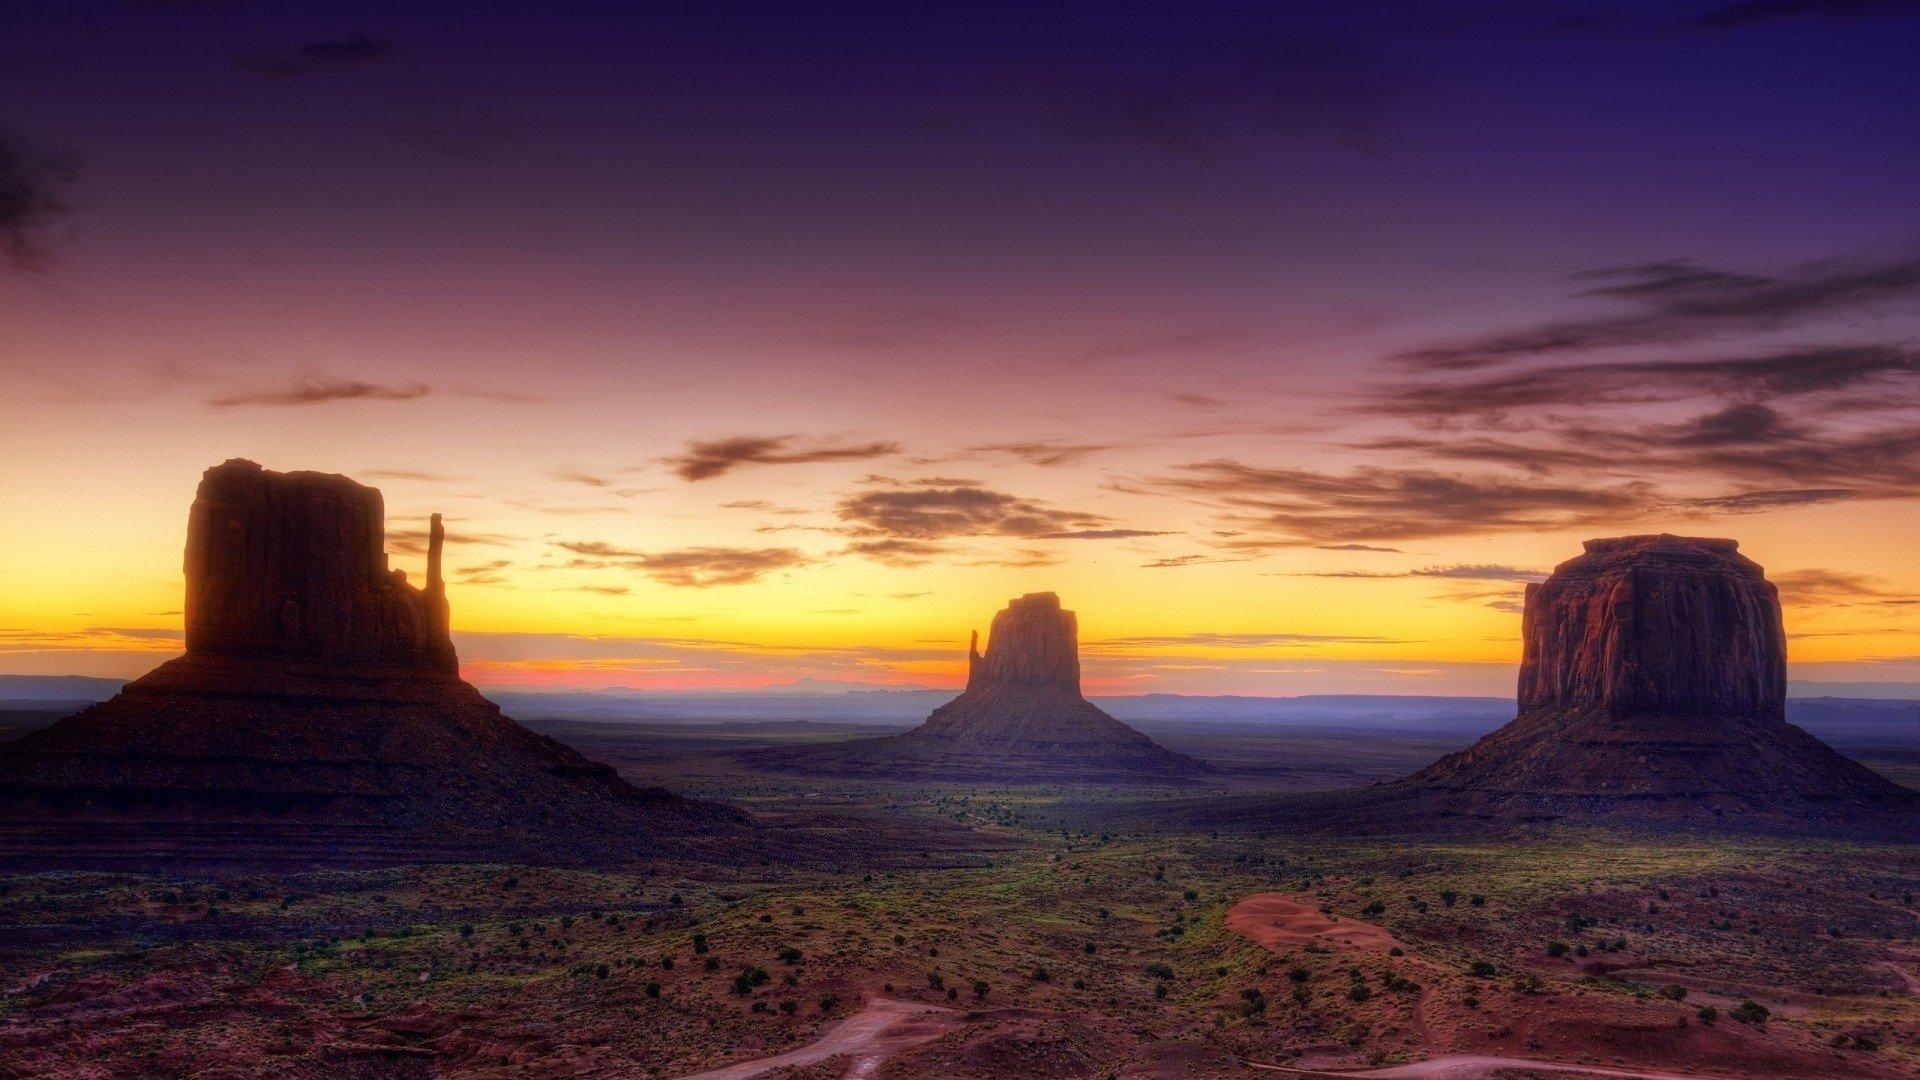 wallpaper sunset mountain arizona - photo #10